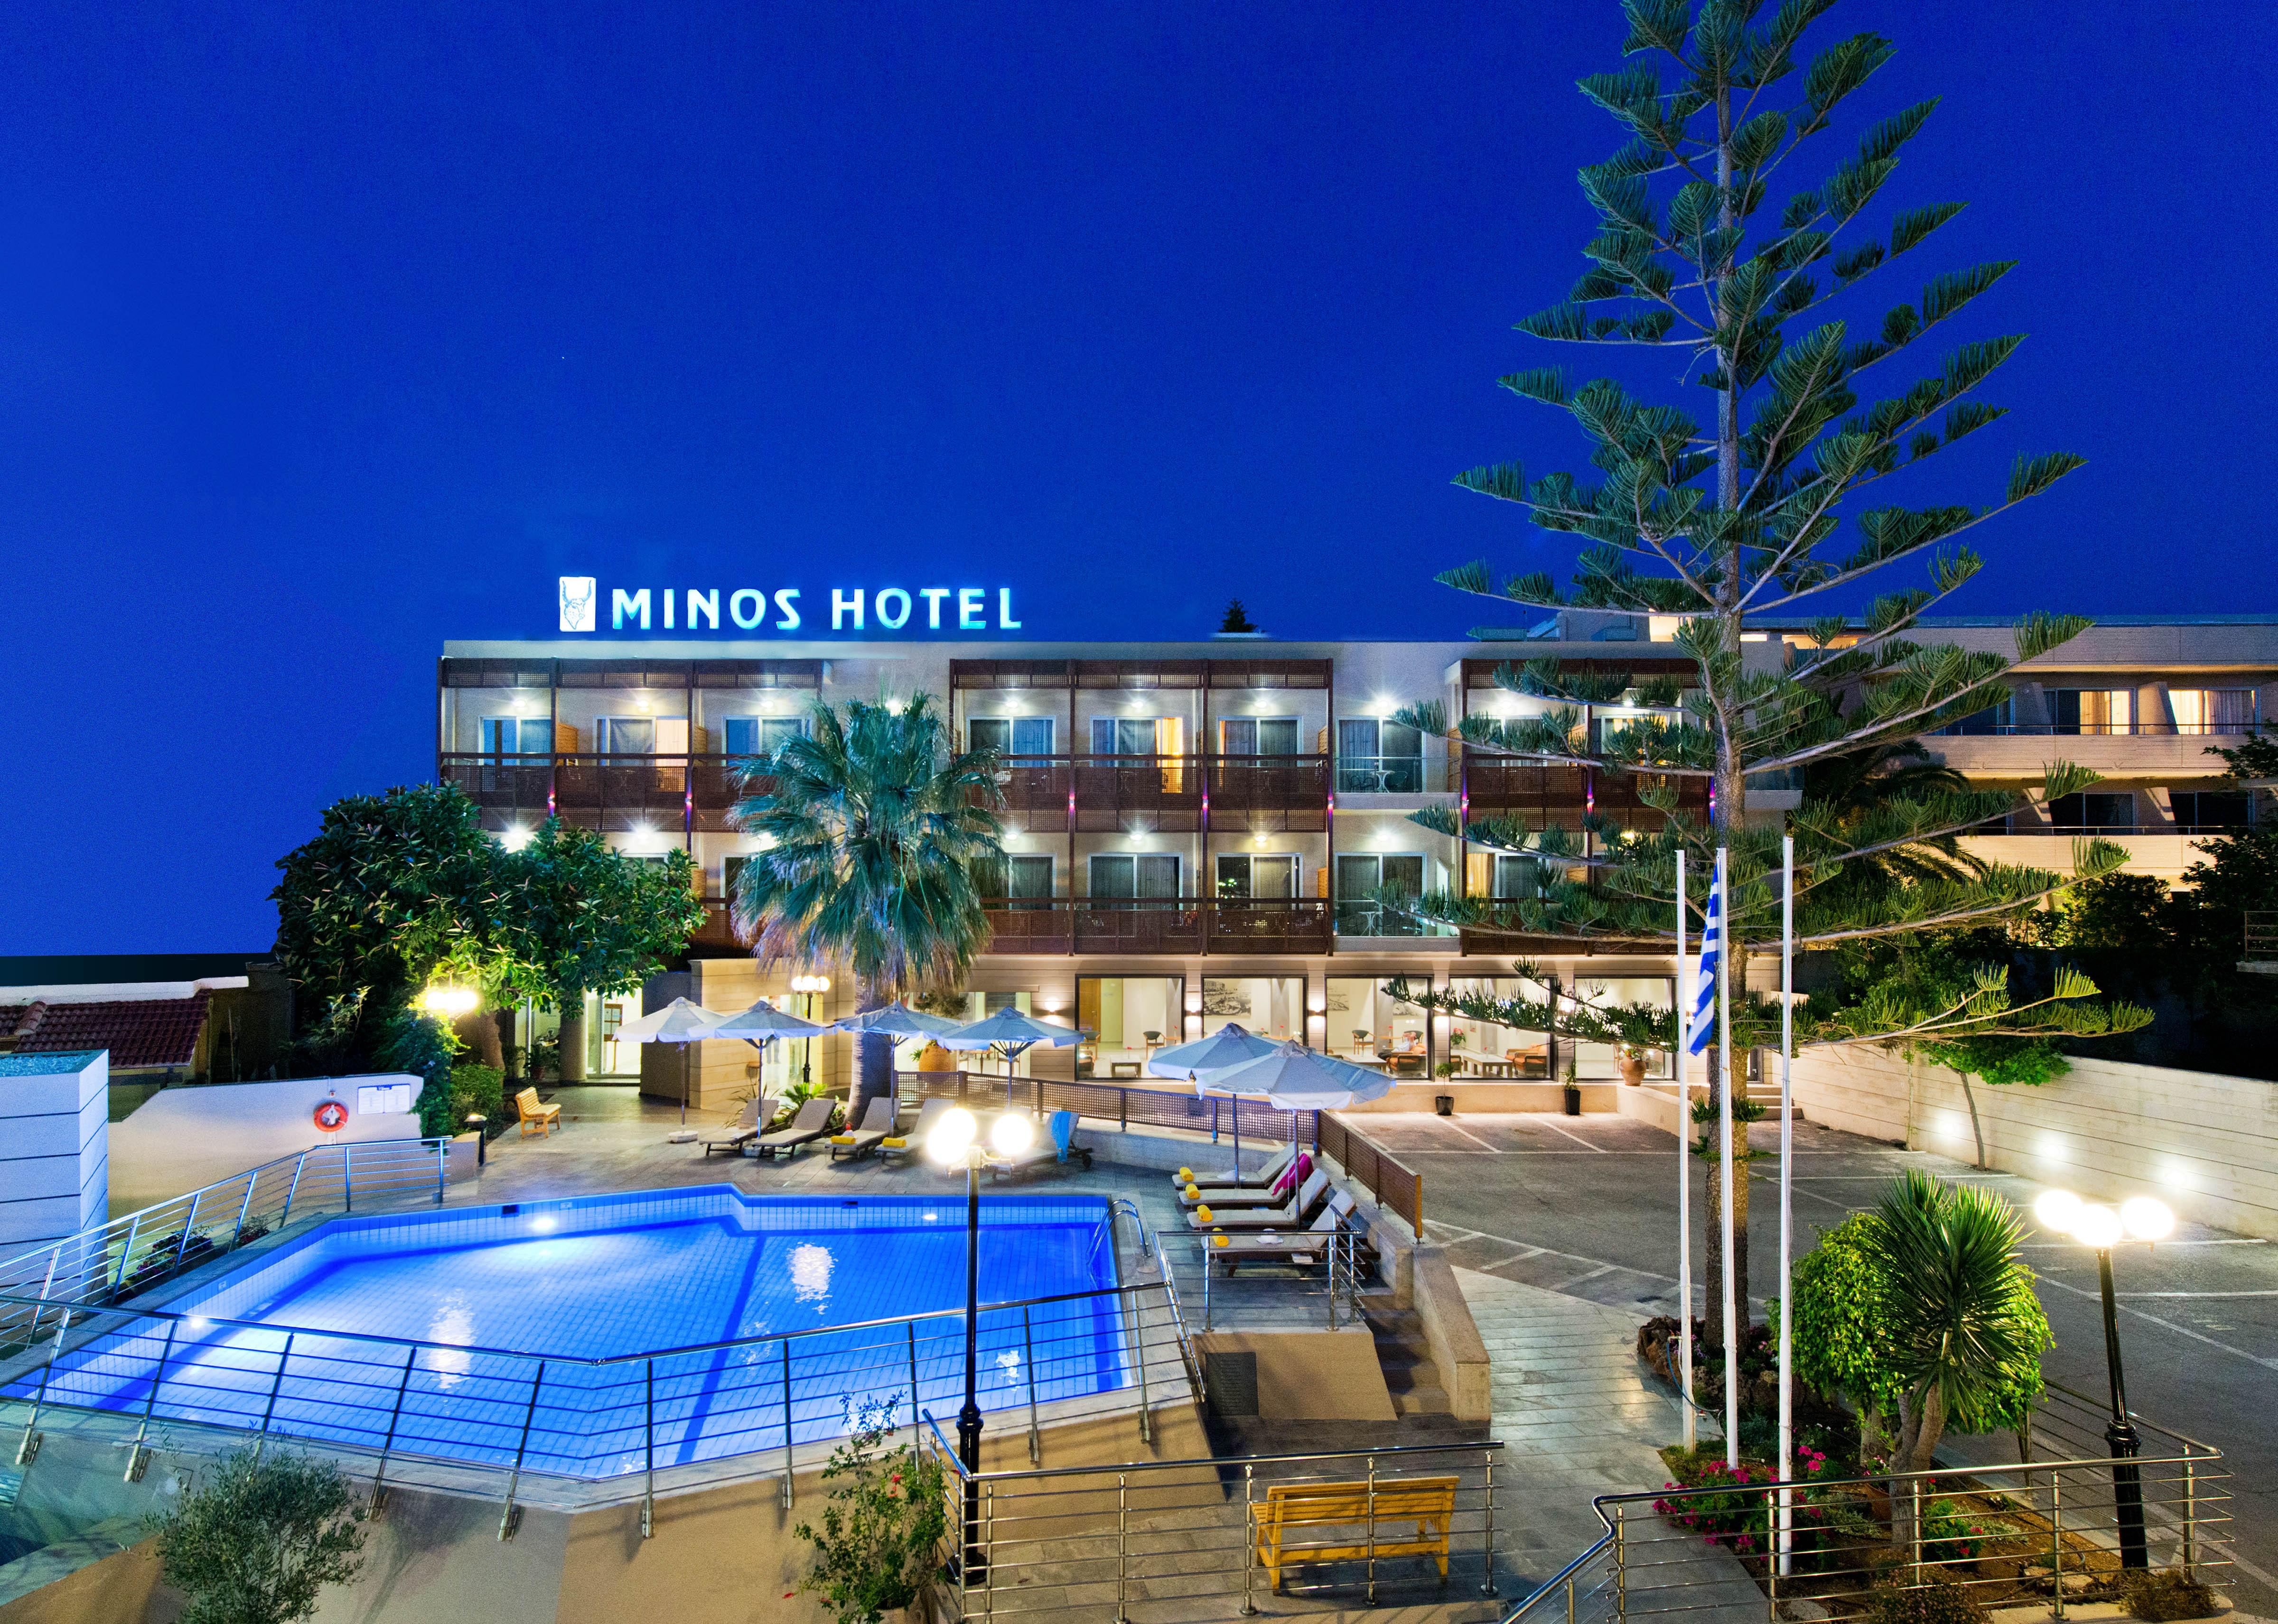 Minos Hotel In Rethymno Crete 4 Star Hotel Rethymno